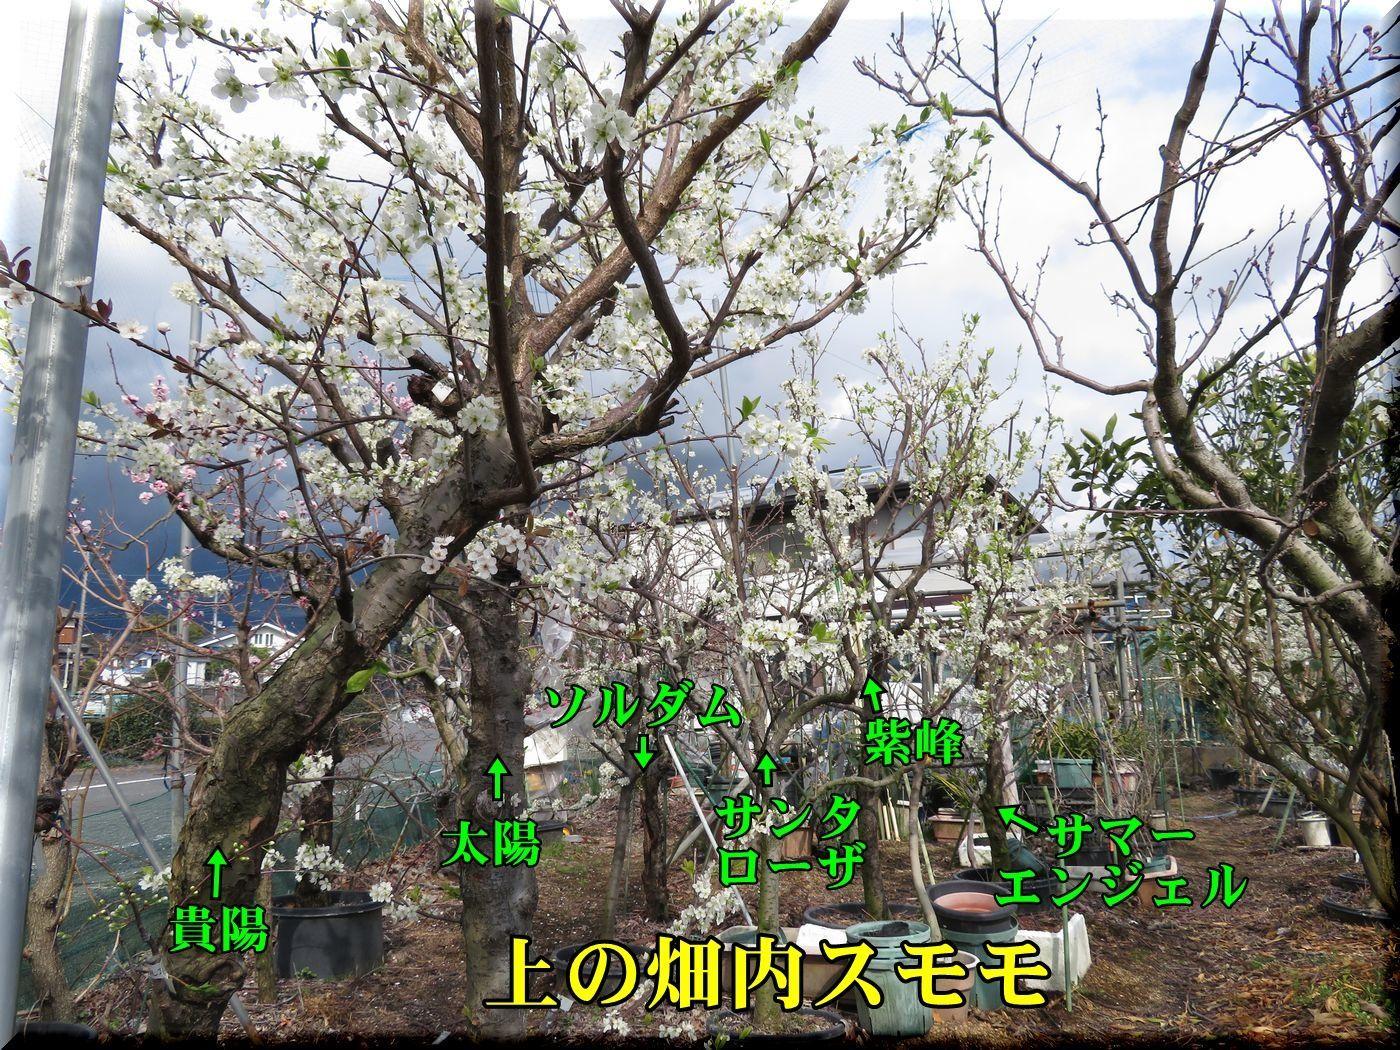 1sumomo180323_021.jpg